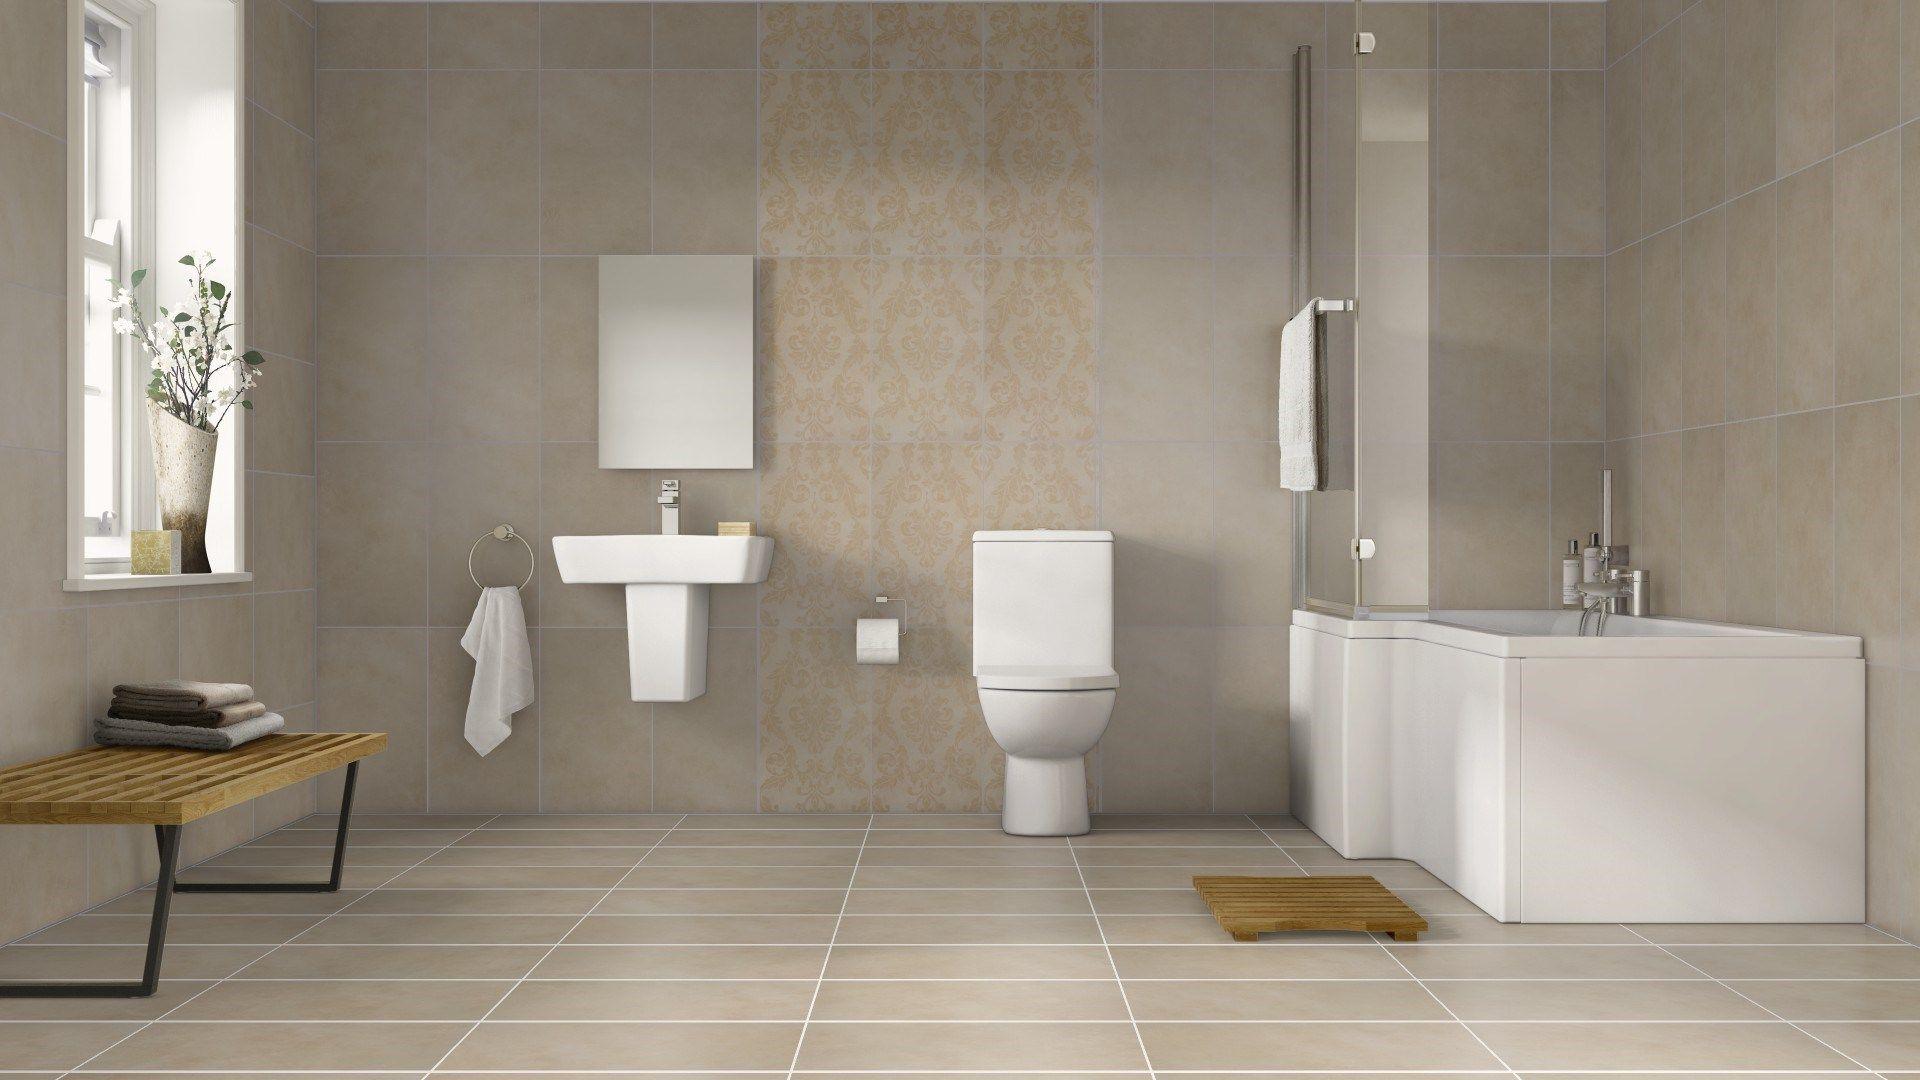 Badezimmer design hd-bilder middleton display  idesign  pinterest  display and house